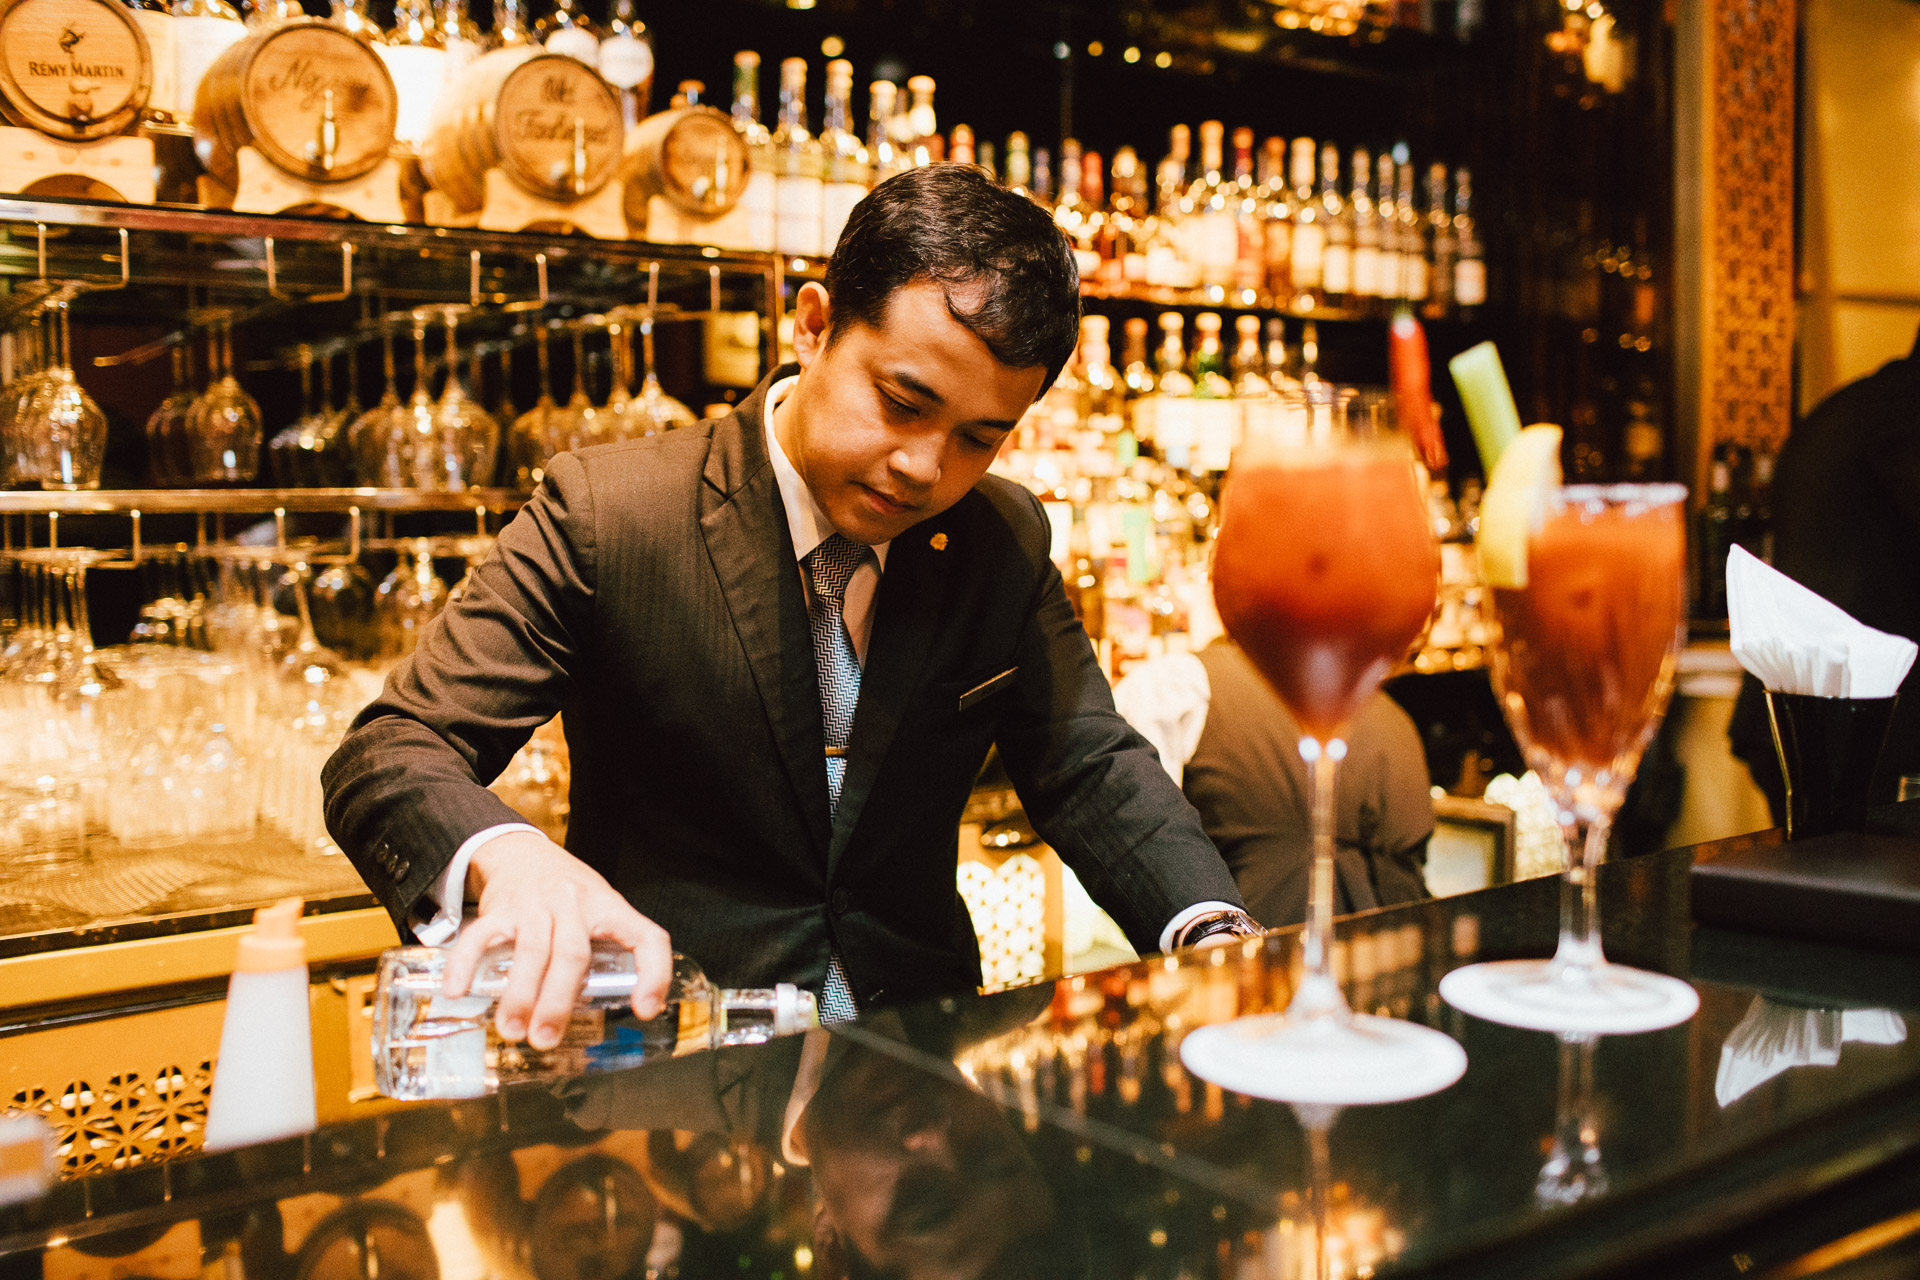 st-regis-singapore-marriott-luxury-hotel-photographer-4.jpg